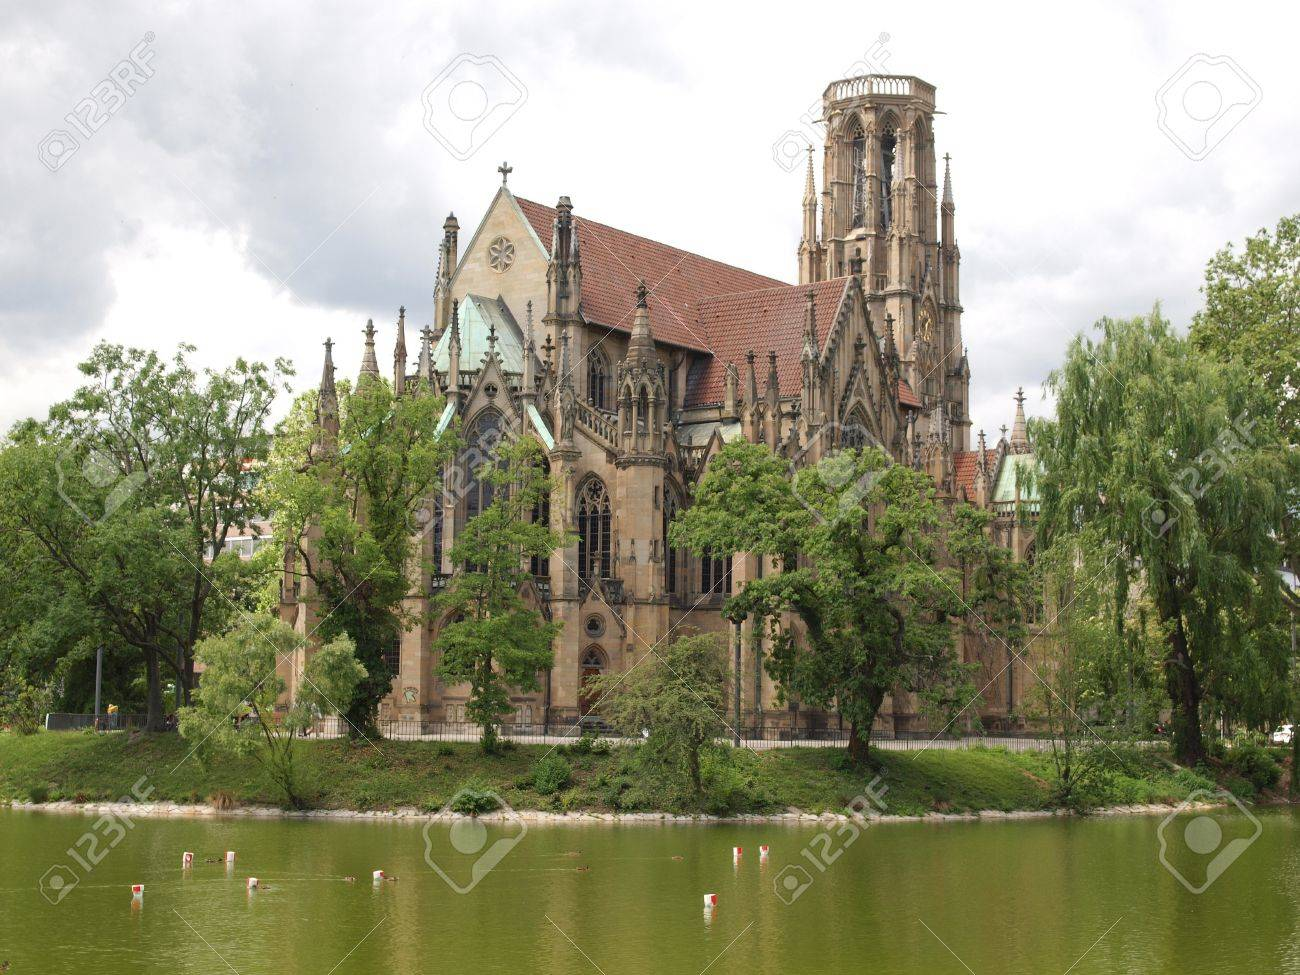 The Johanneskirche gothic church in Stuttgart, Germany Stock Photo - 14553248